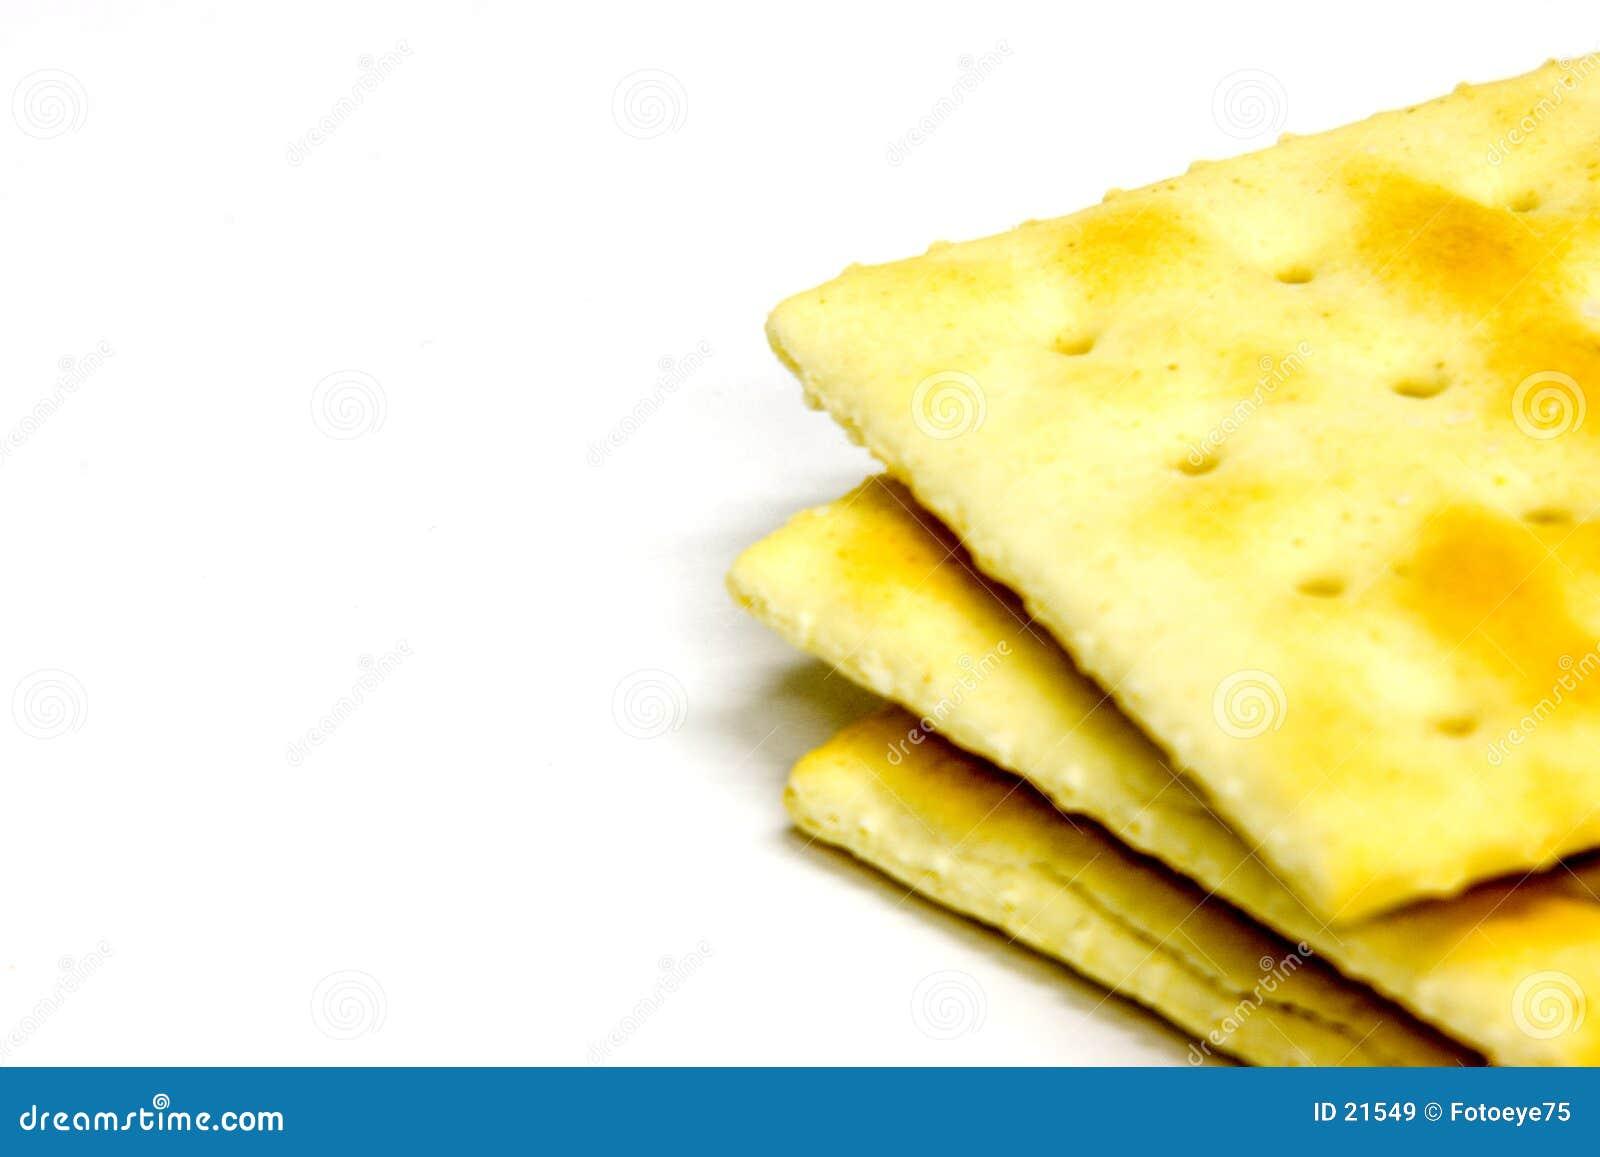 3 Cracker